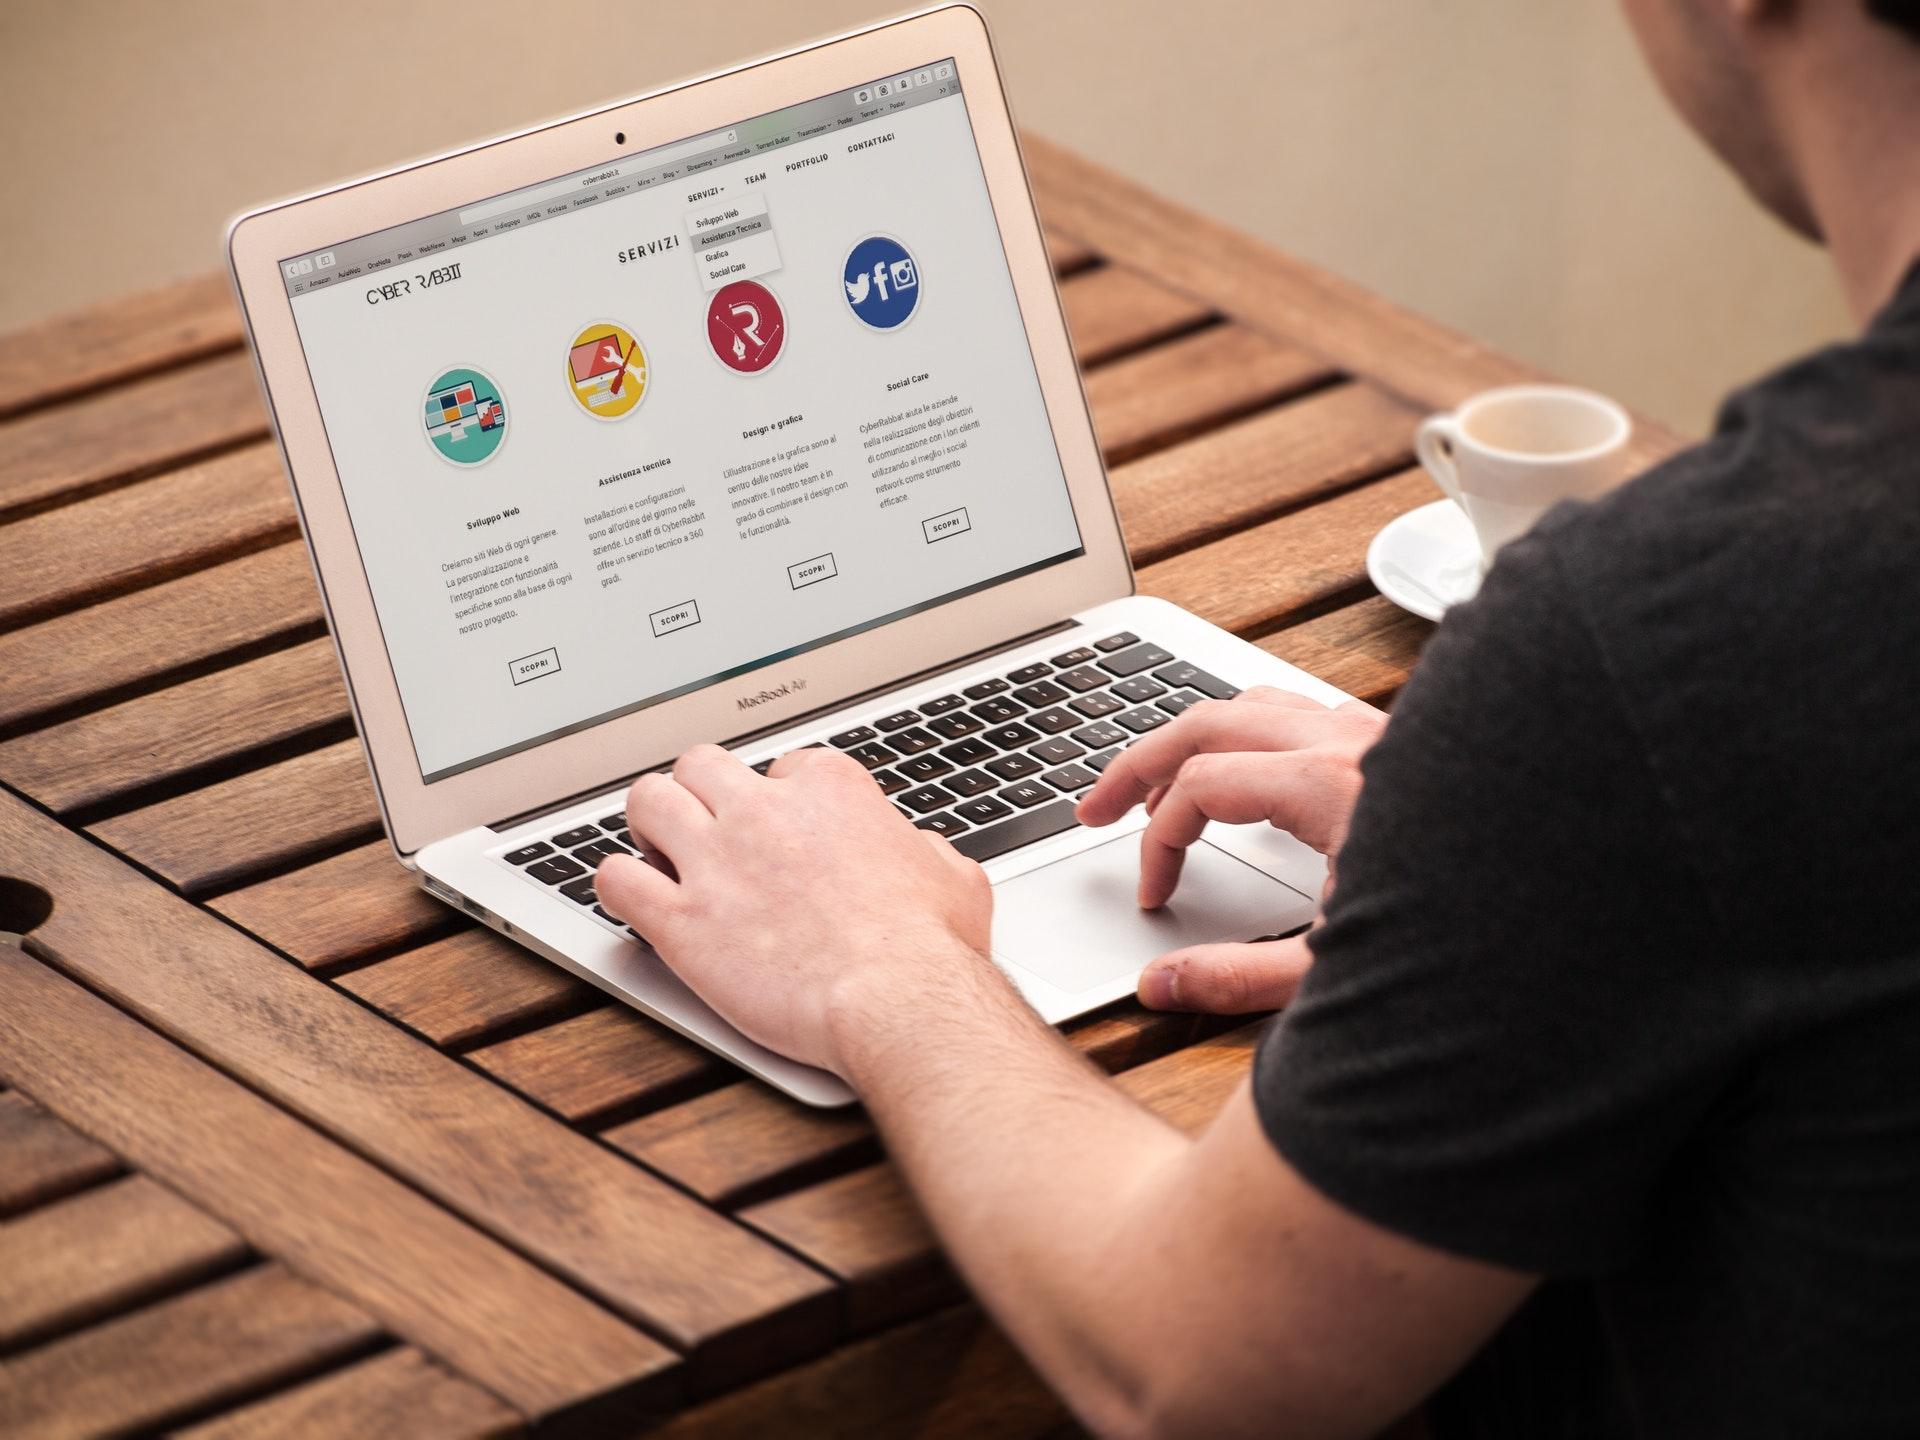 apple-computer-desk-laptop-209151